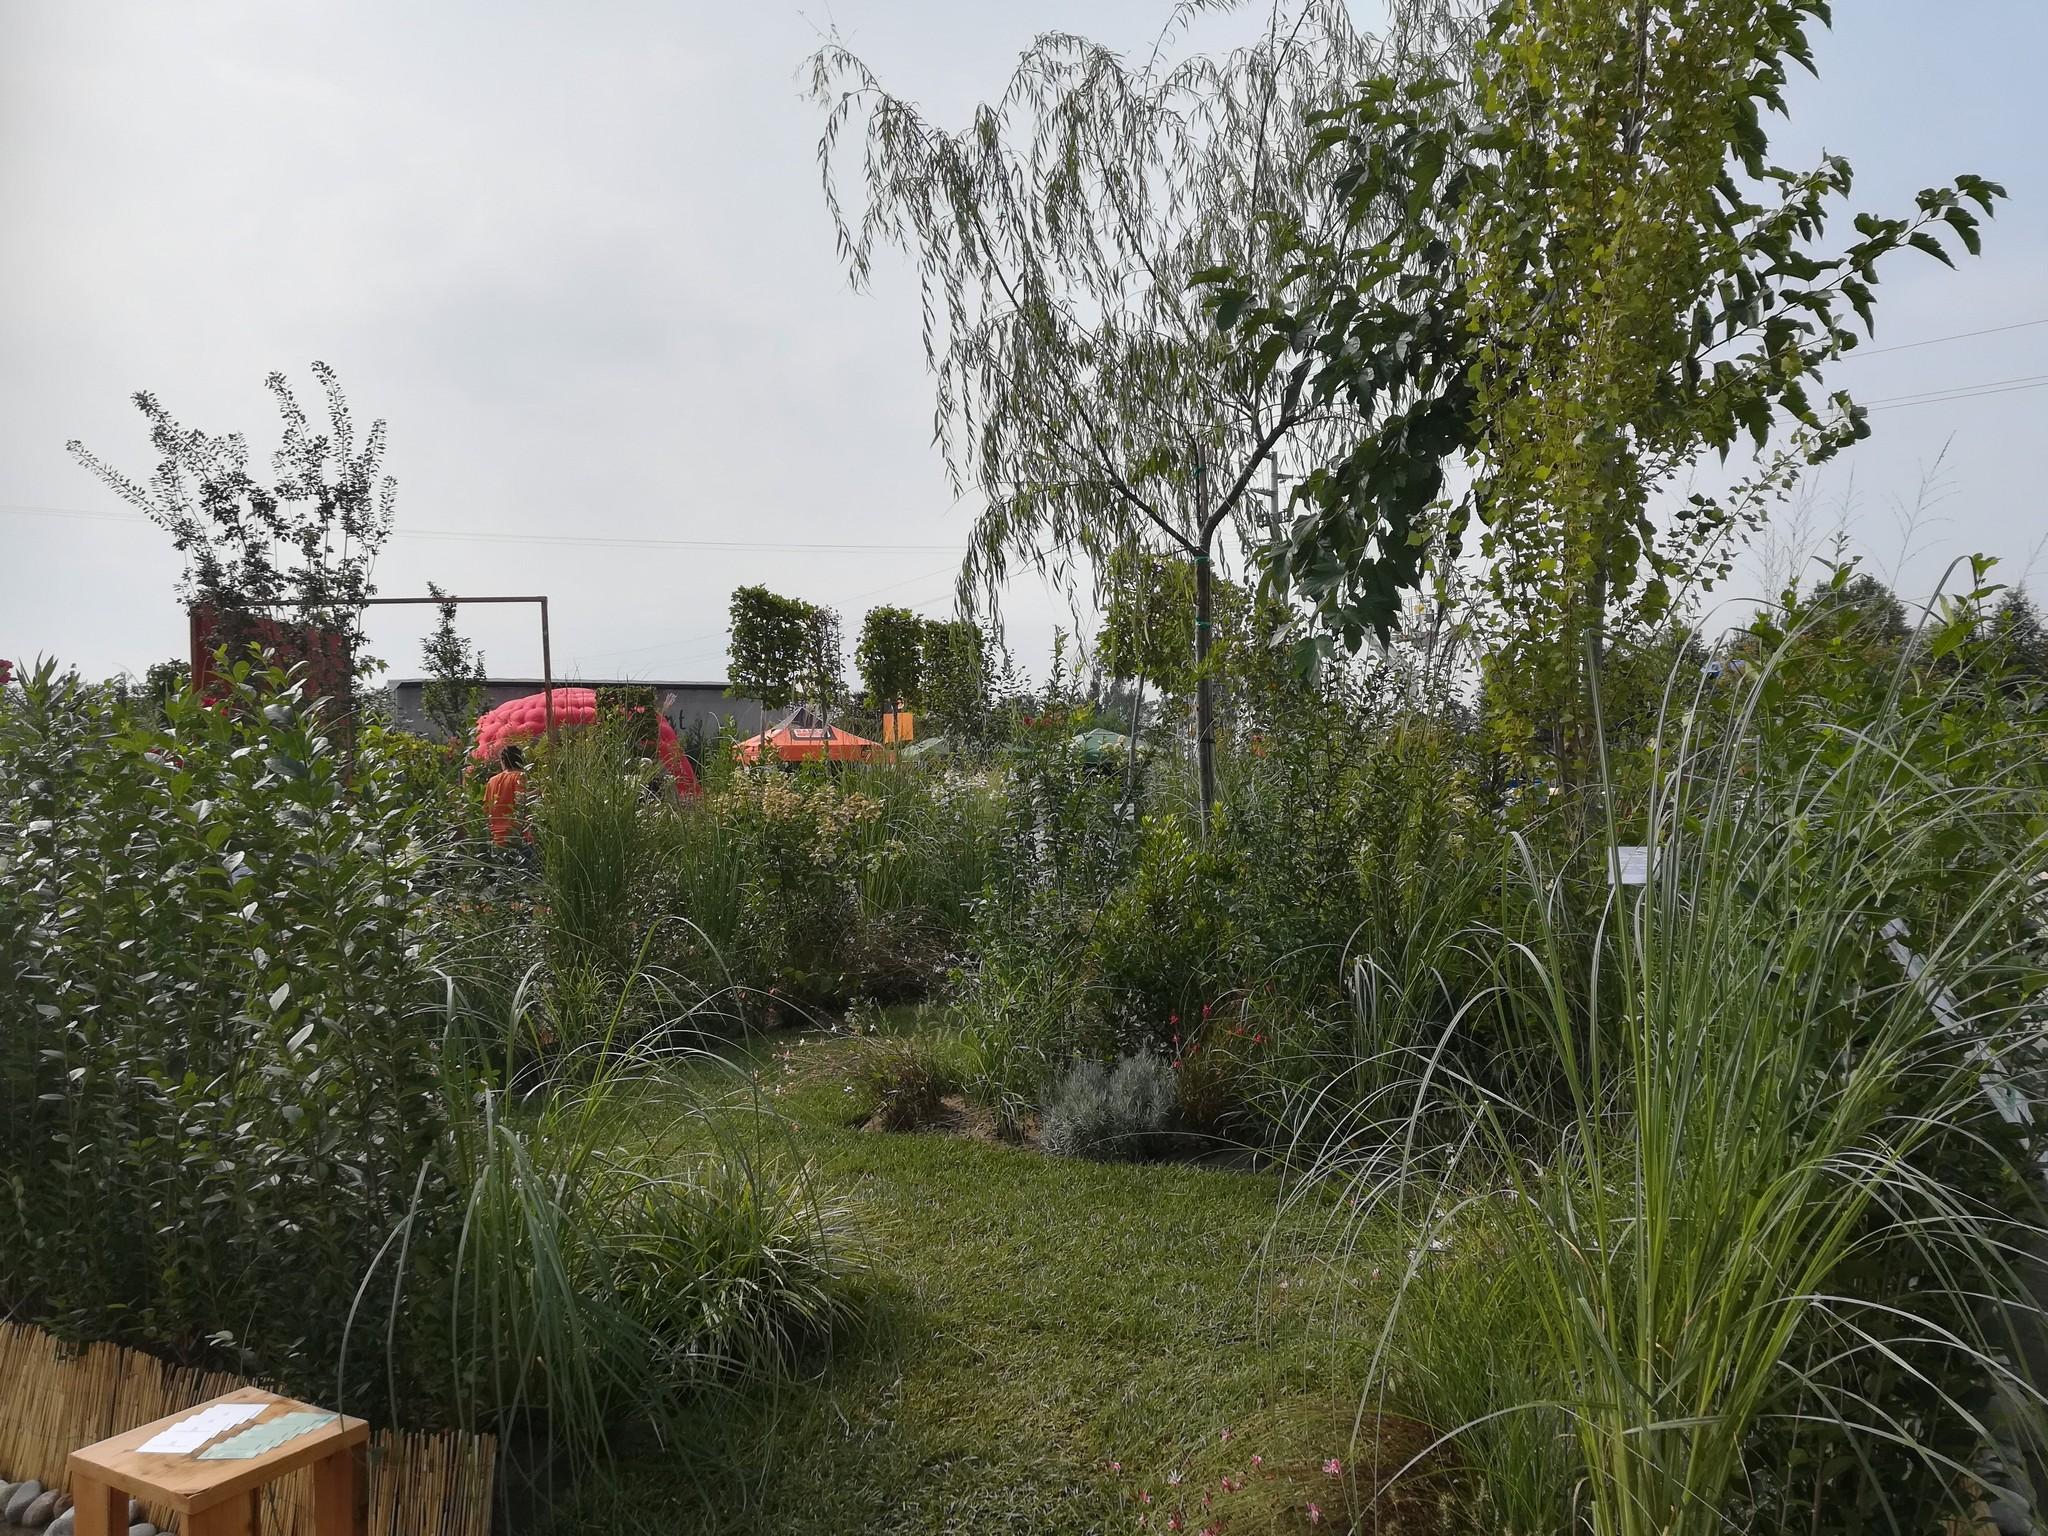 Concorso-giardini-Verdeggiando_48-Sentiero-italiano-HS194-Frontini-Giovanni-Hortus-Simplicium